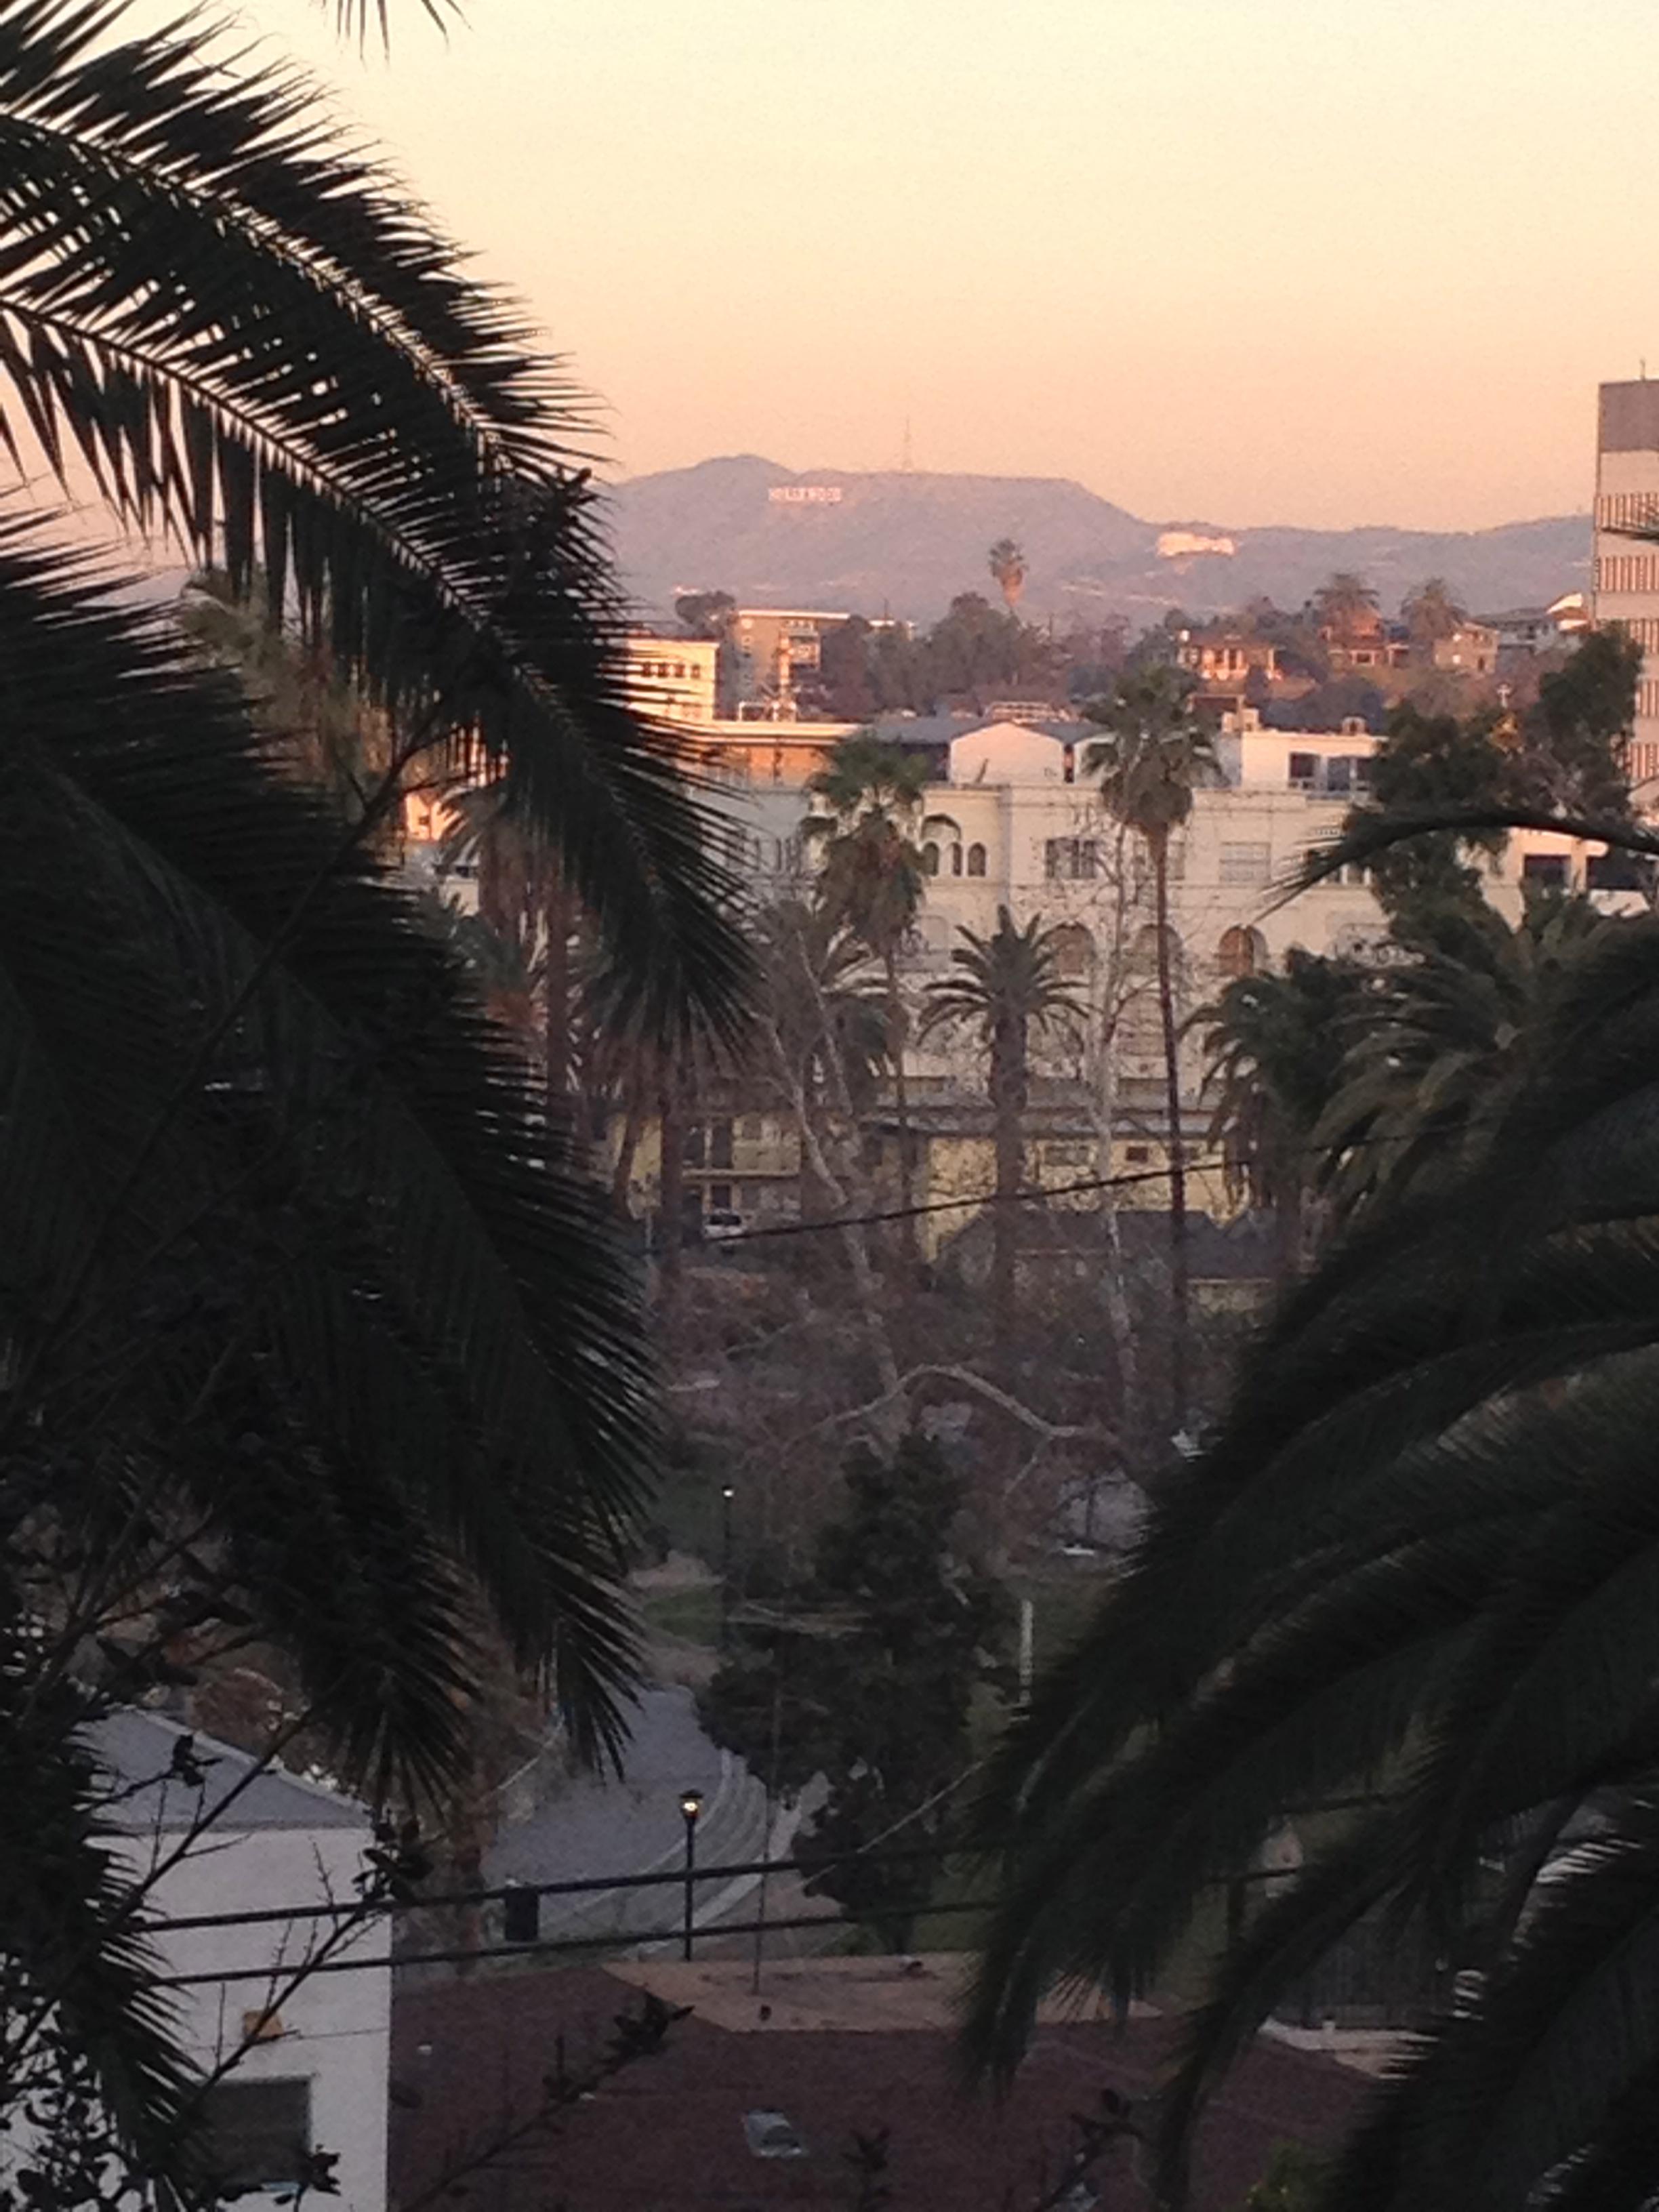 Sunset over echo park, Casa Lavita, Echo Park, CA